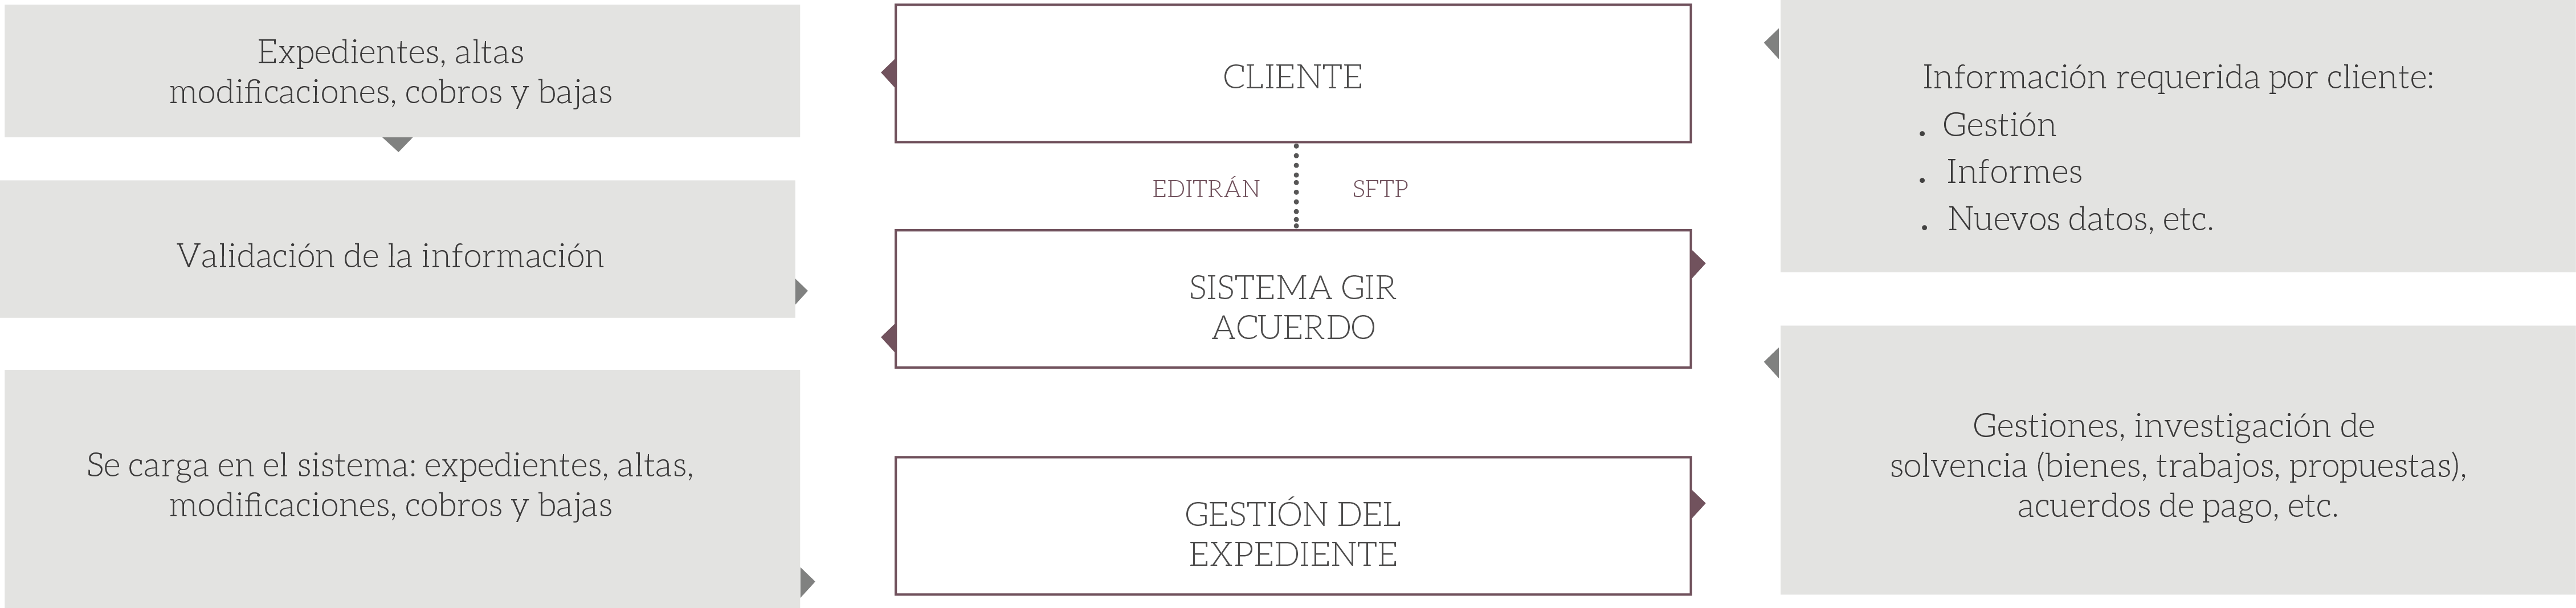 esquema_1_purple